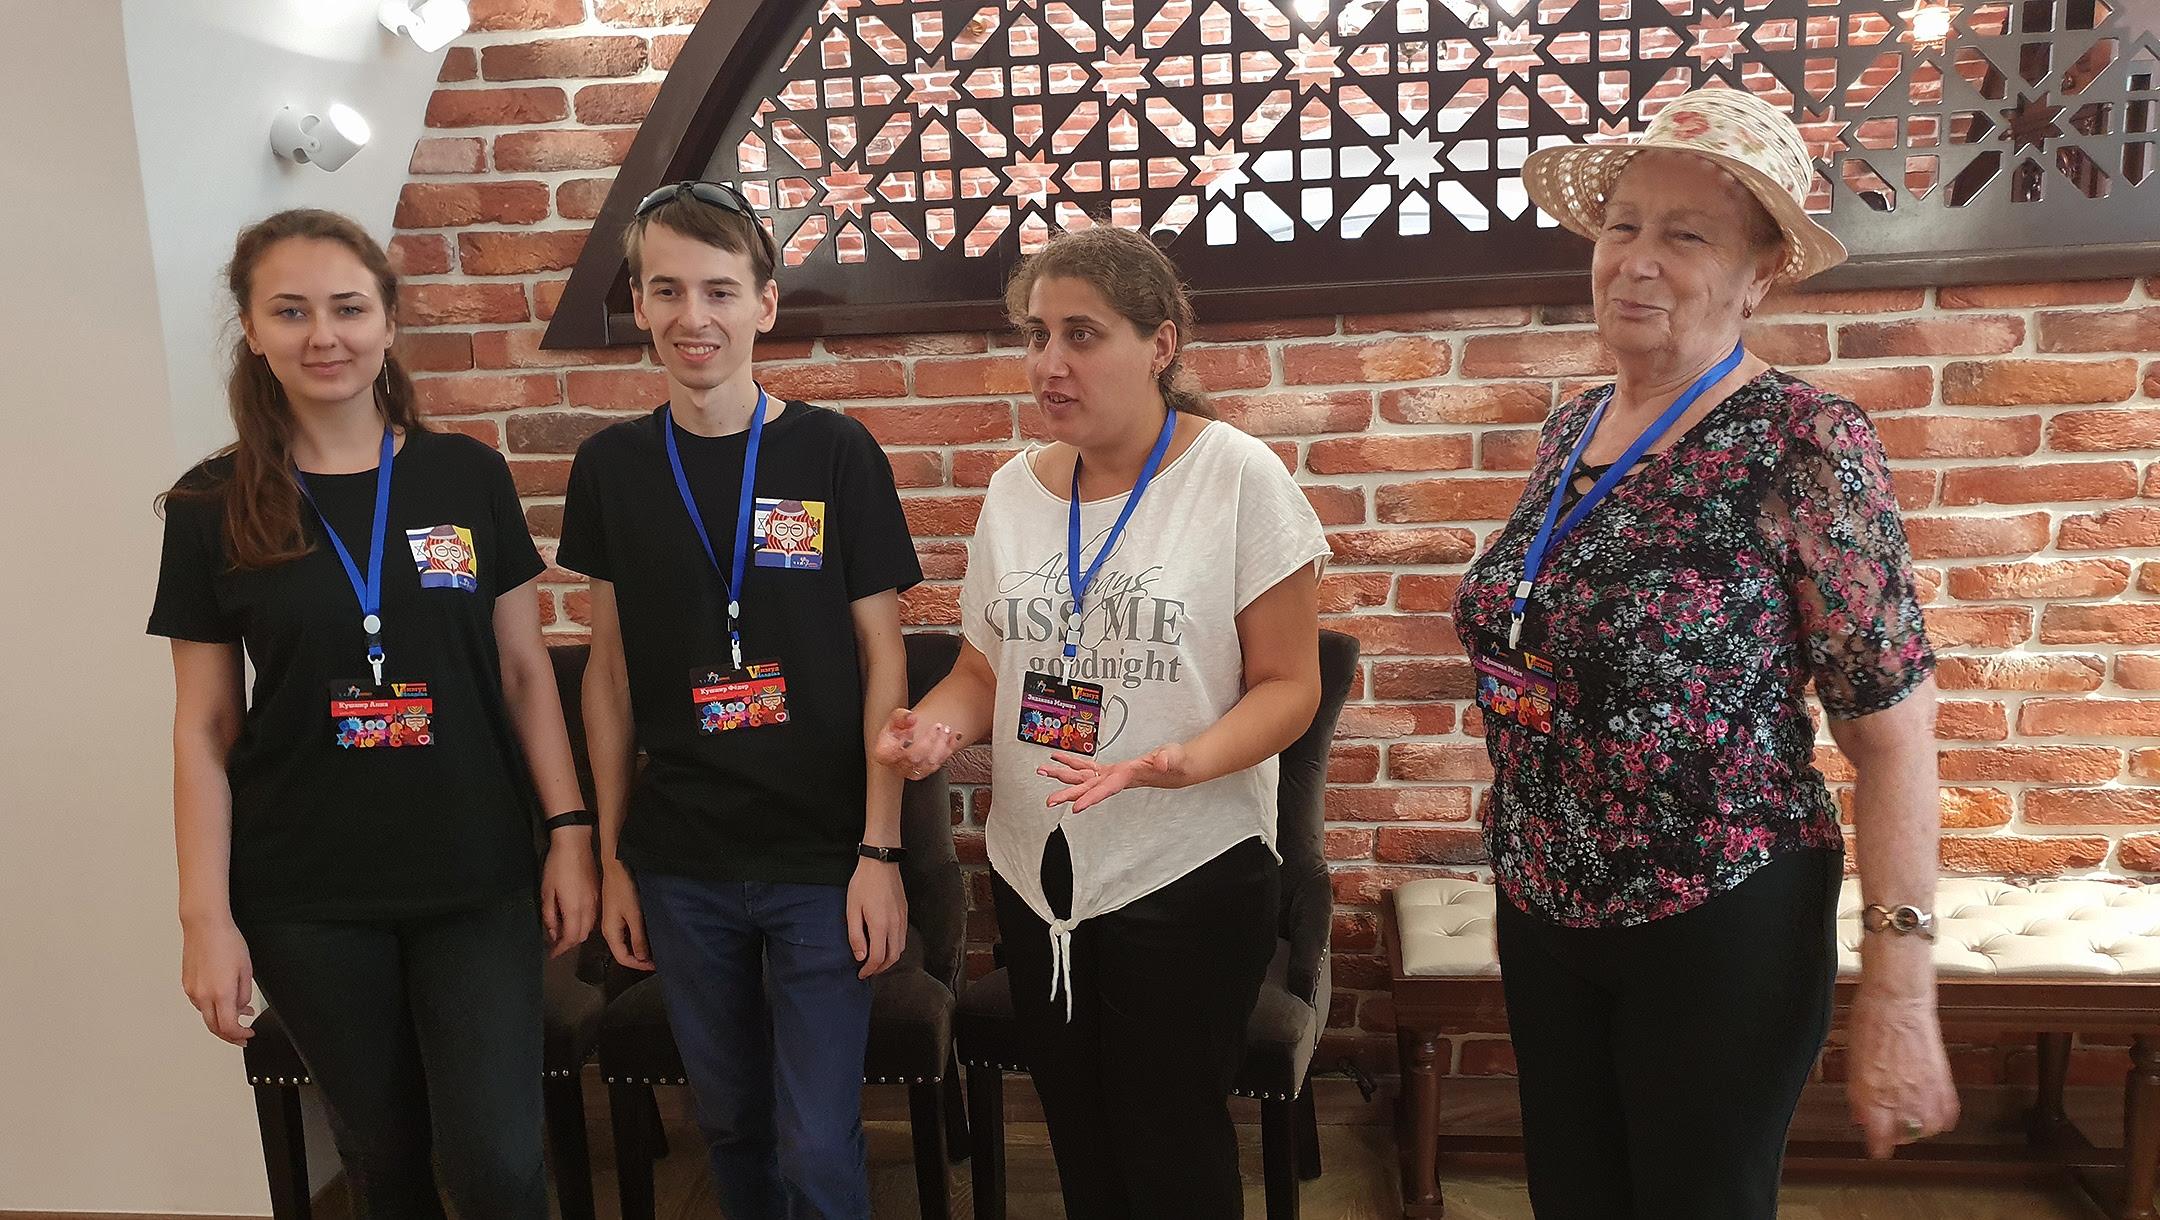 Musia Efimova, right, Marina Edakova and Fiodor and Anna Kushnir at the Wooden Synagogue of Chisinau, Moldova on Aug. 26, 2019. (Cnaan Liphshiz)